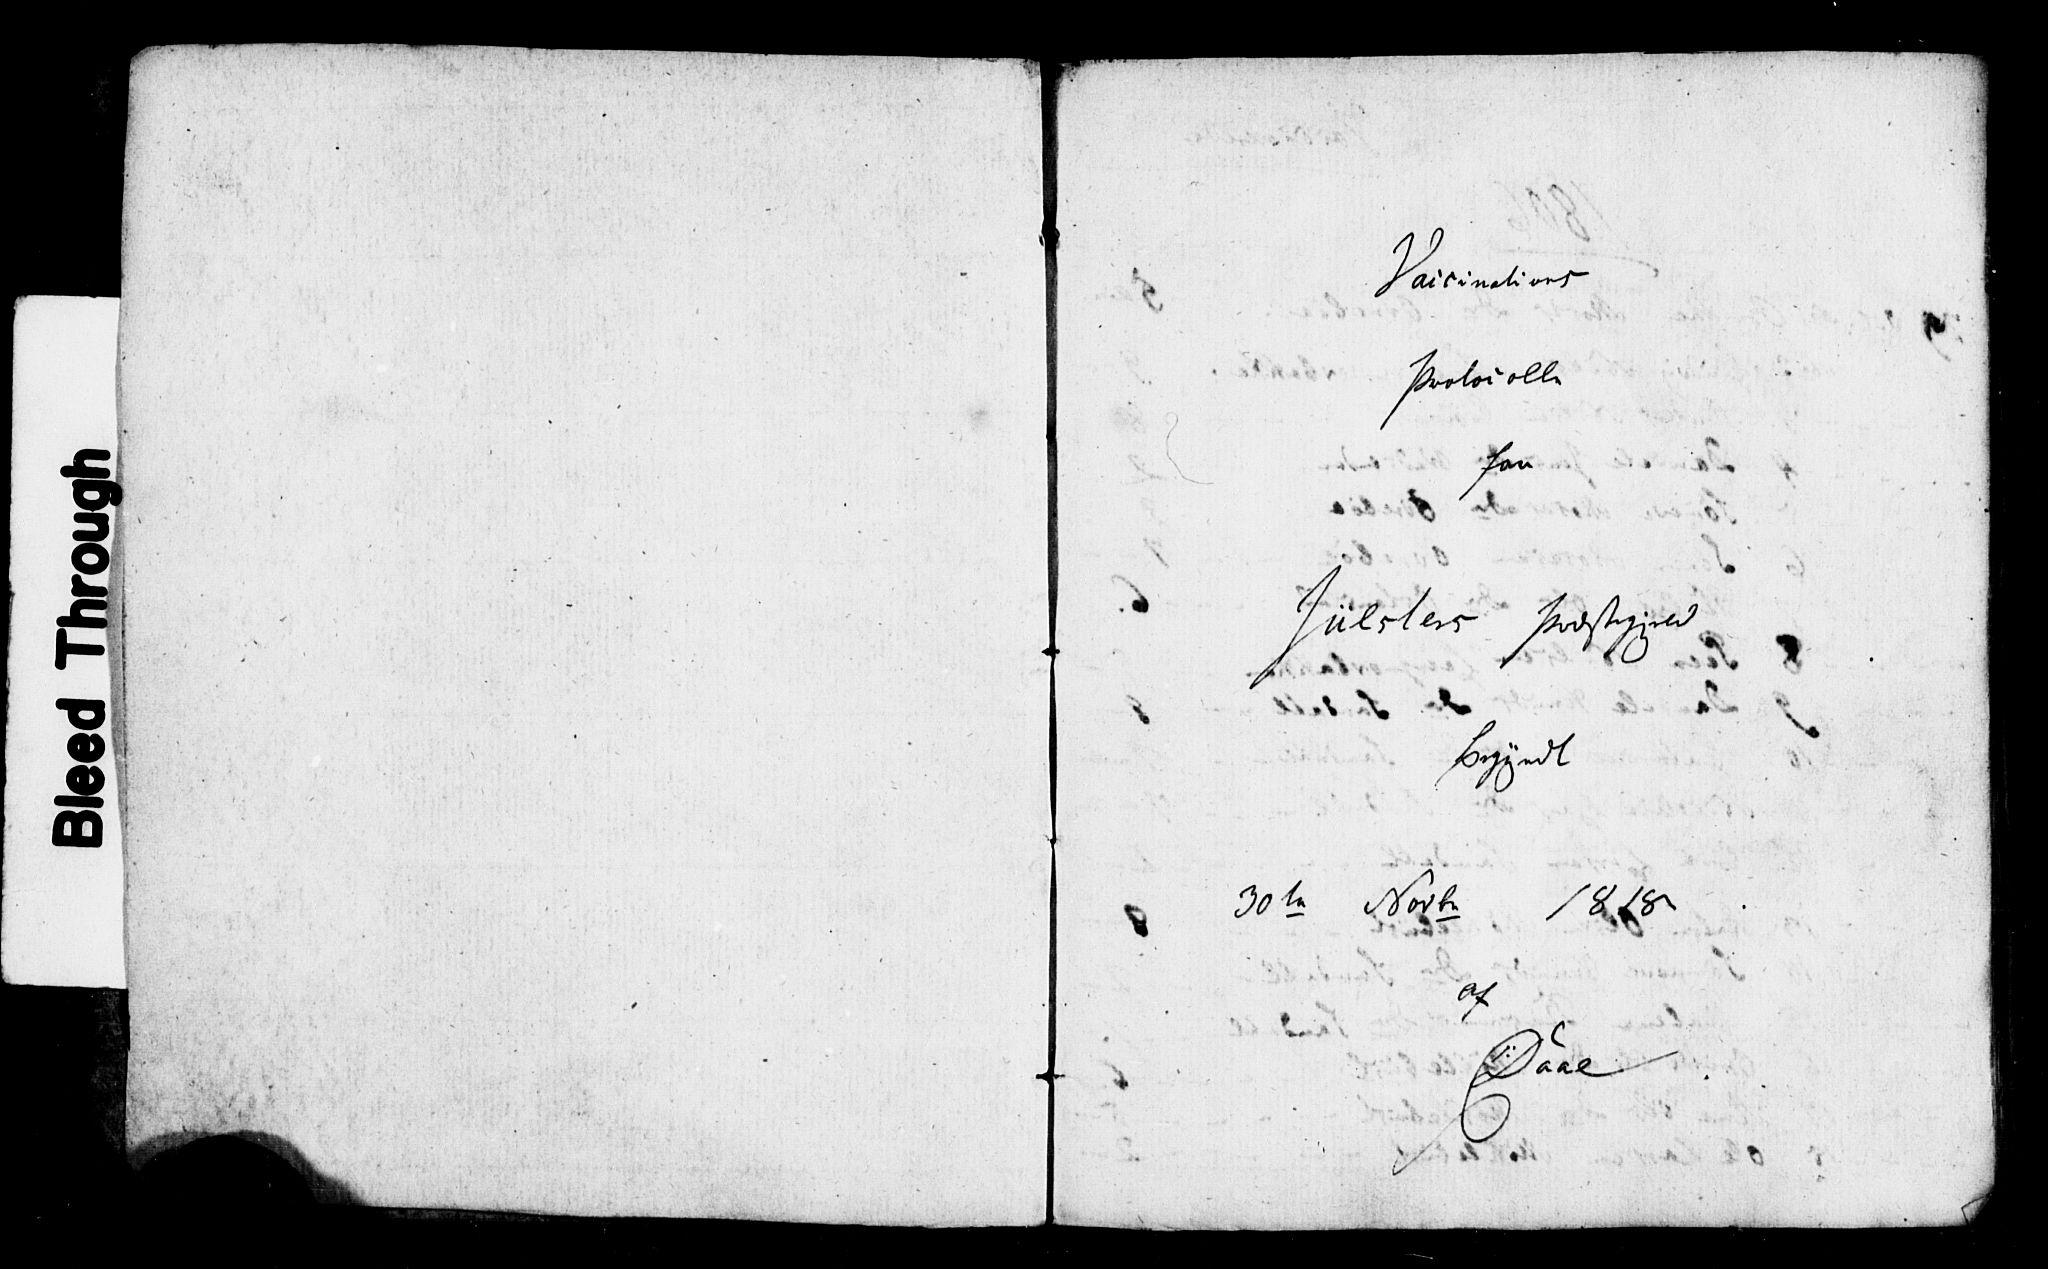 SAB, Jølster Sokneprestembete, H/Haa/Haaa/L0007: Ministerialbok nr. A 7, 1806-1821